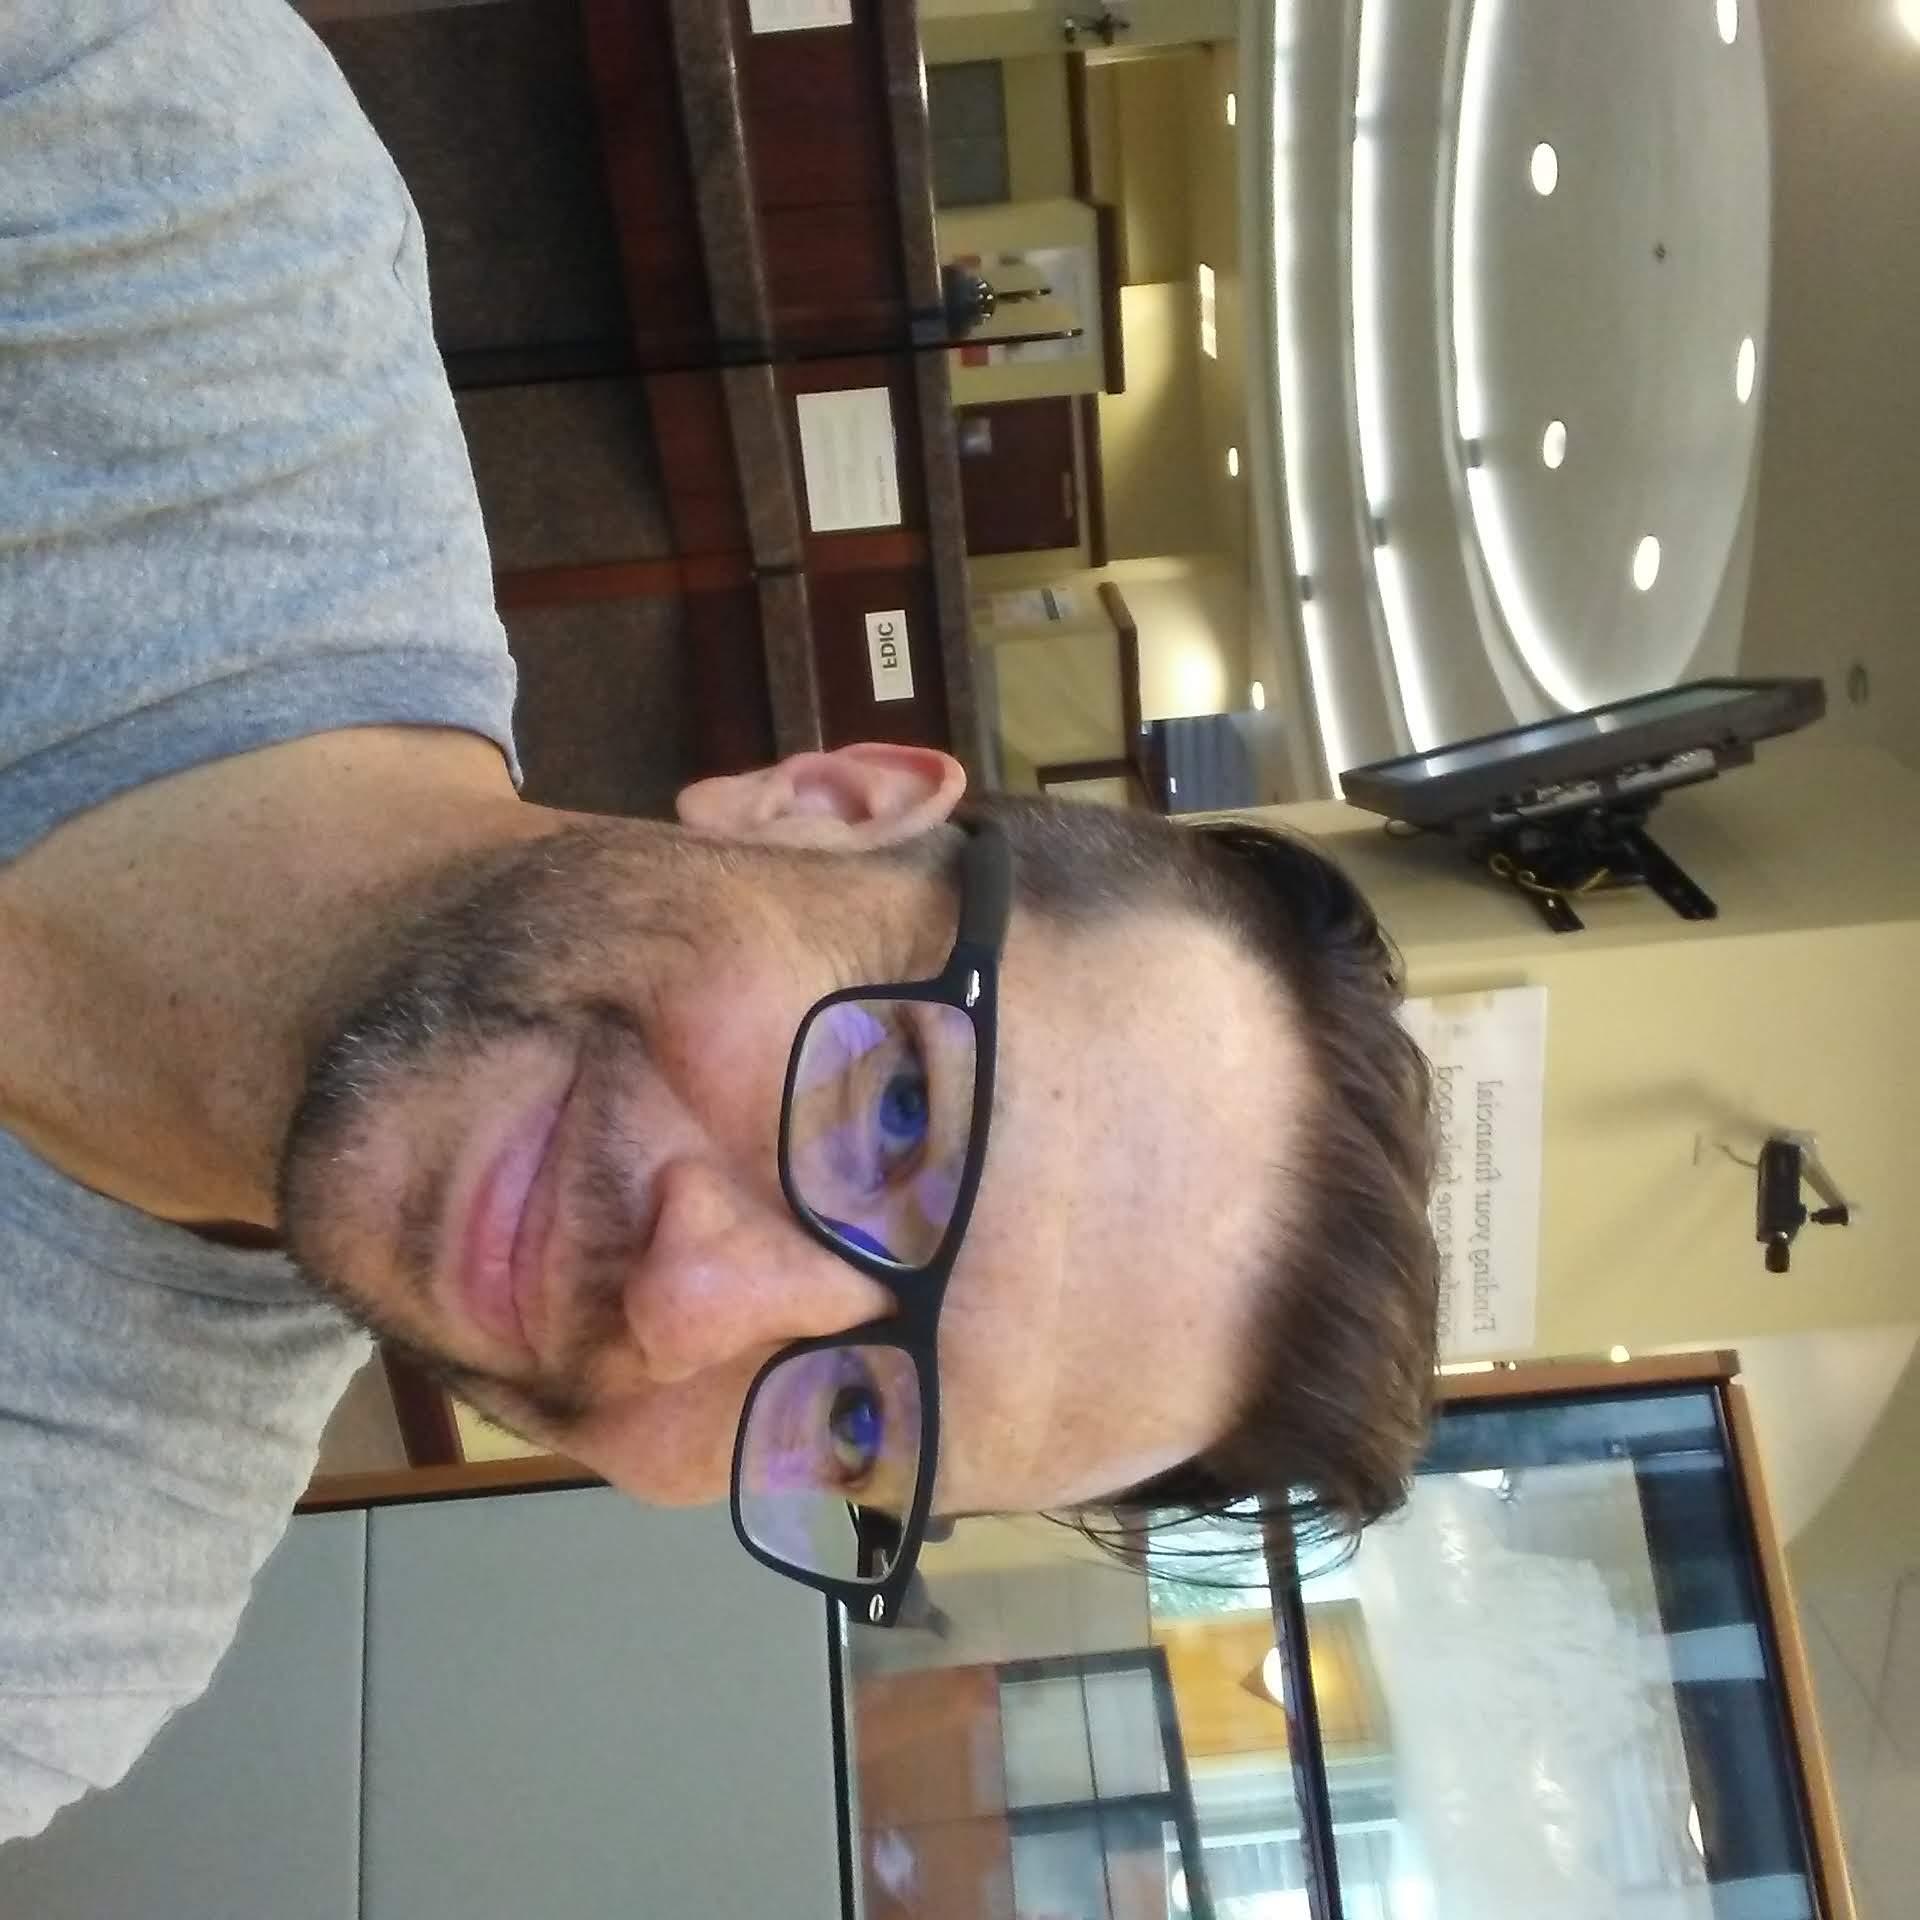 scott_w's avatar